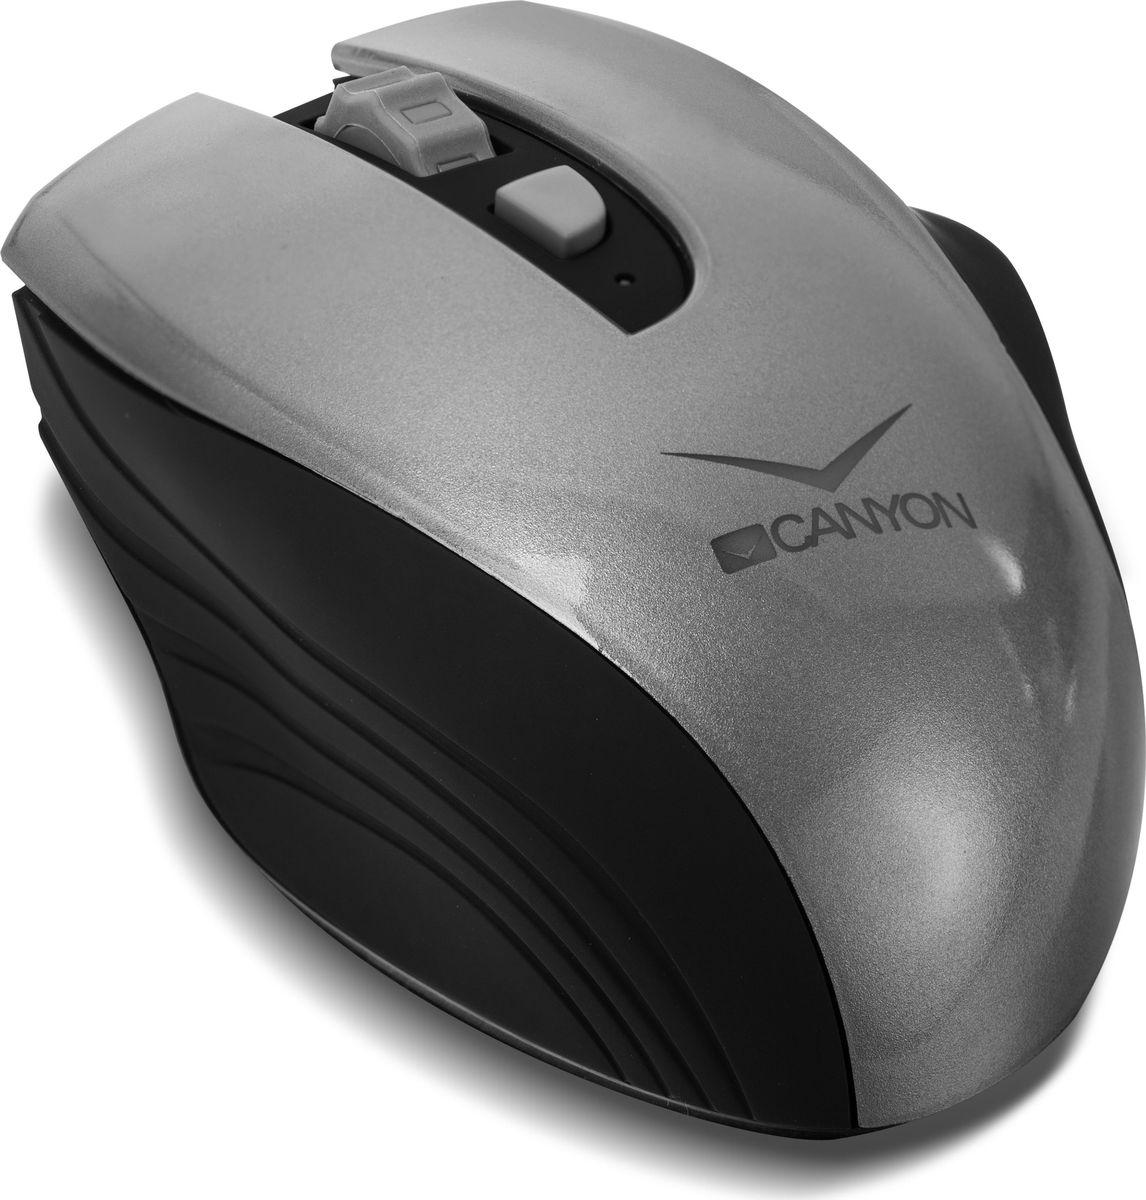 Canyon CNS-CMSW7G, Graphite мышь беспроводная